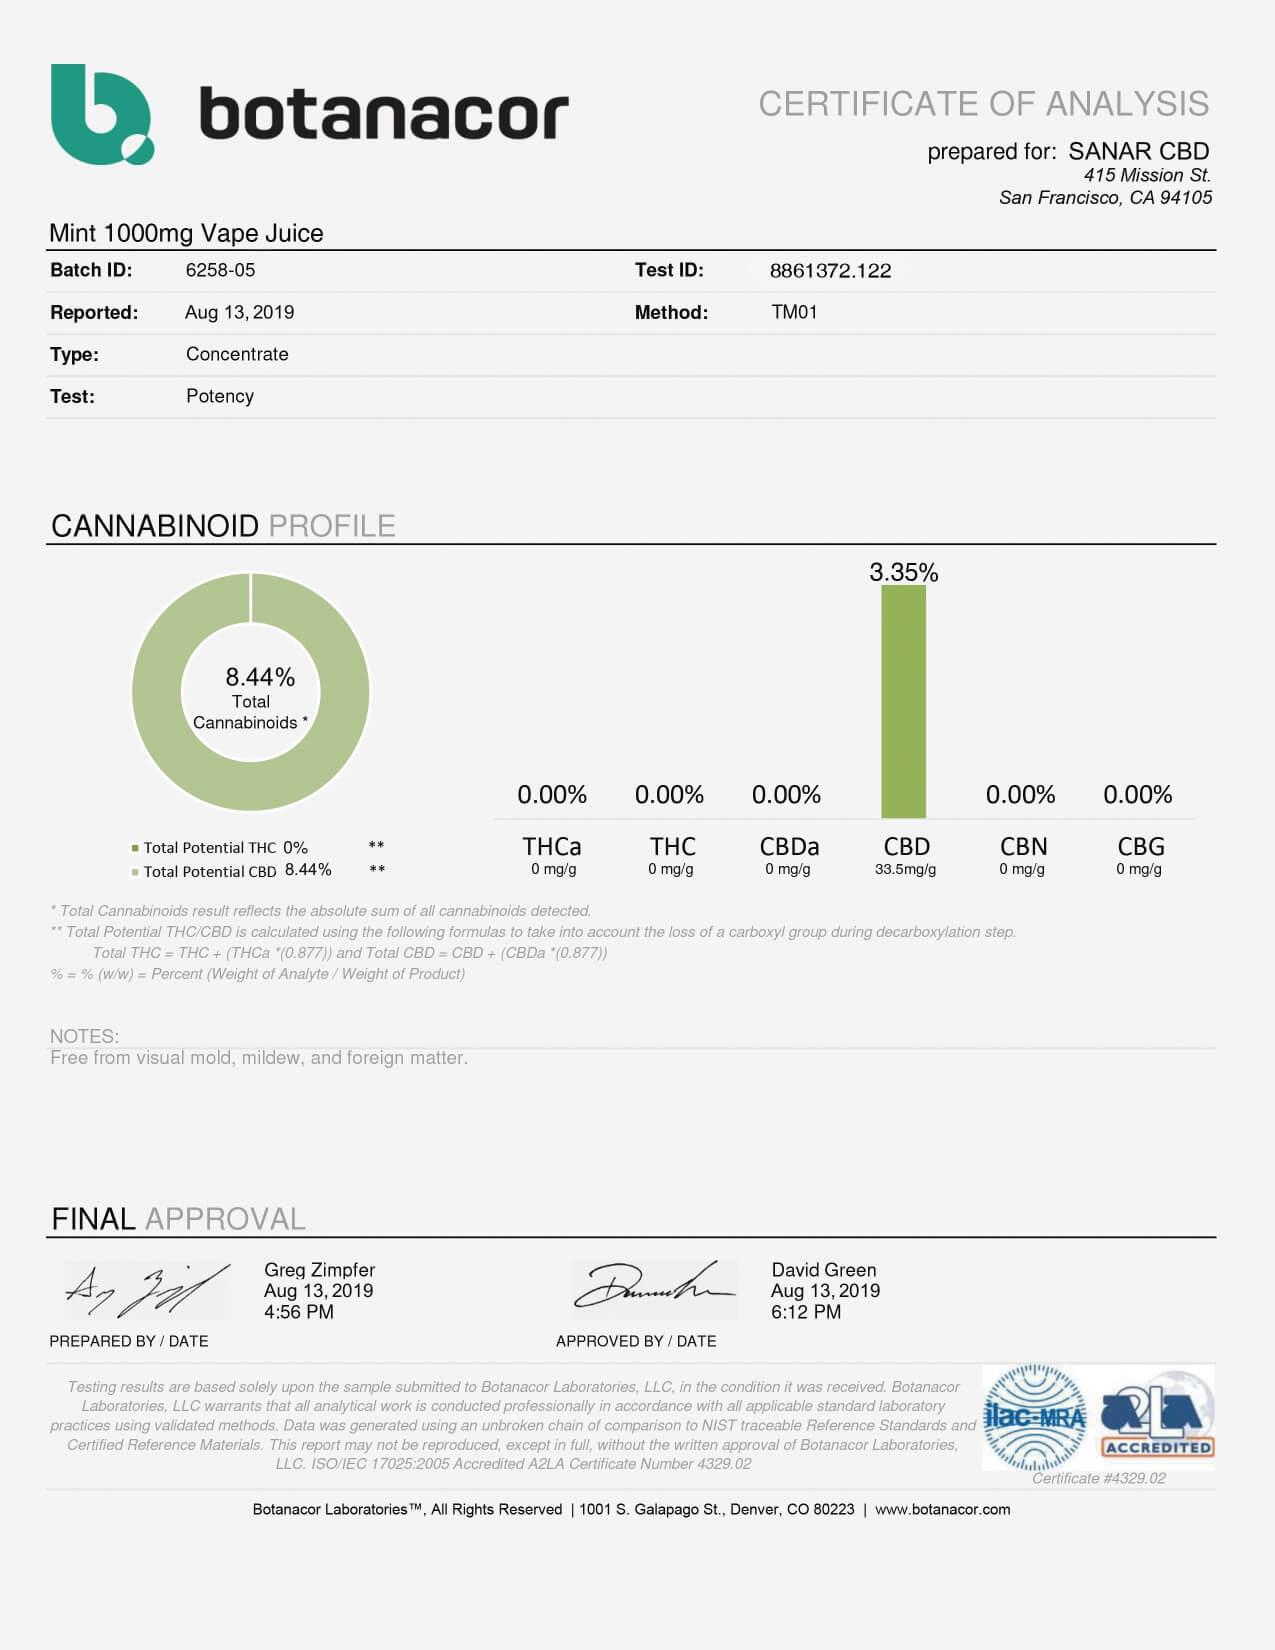 Sanar CBD Vape Juice Mint 1000mg Lab Report